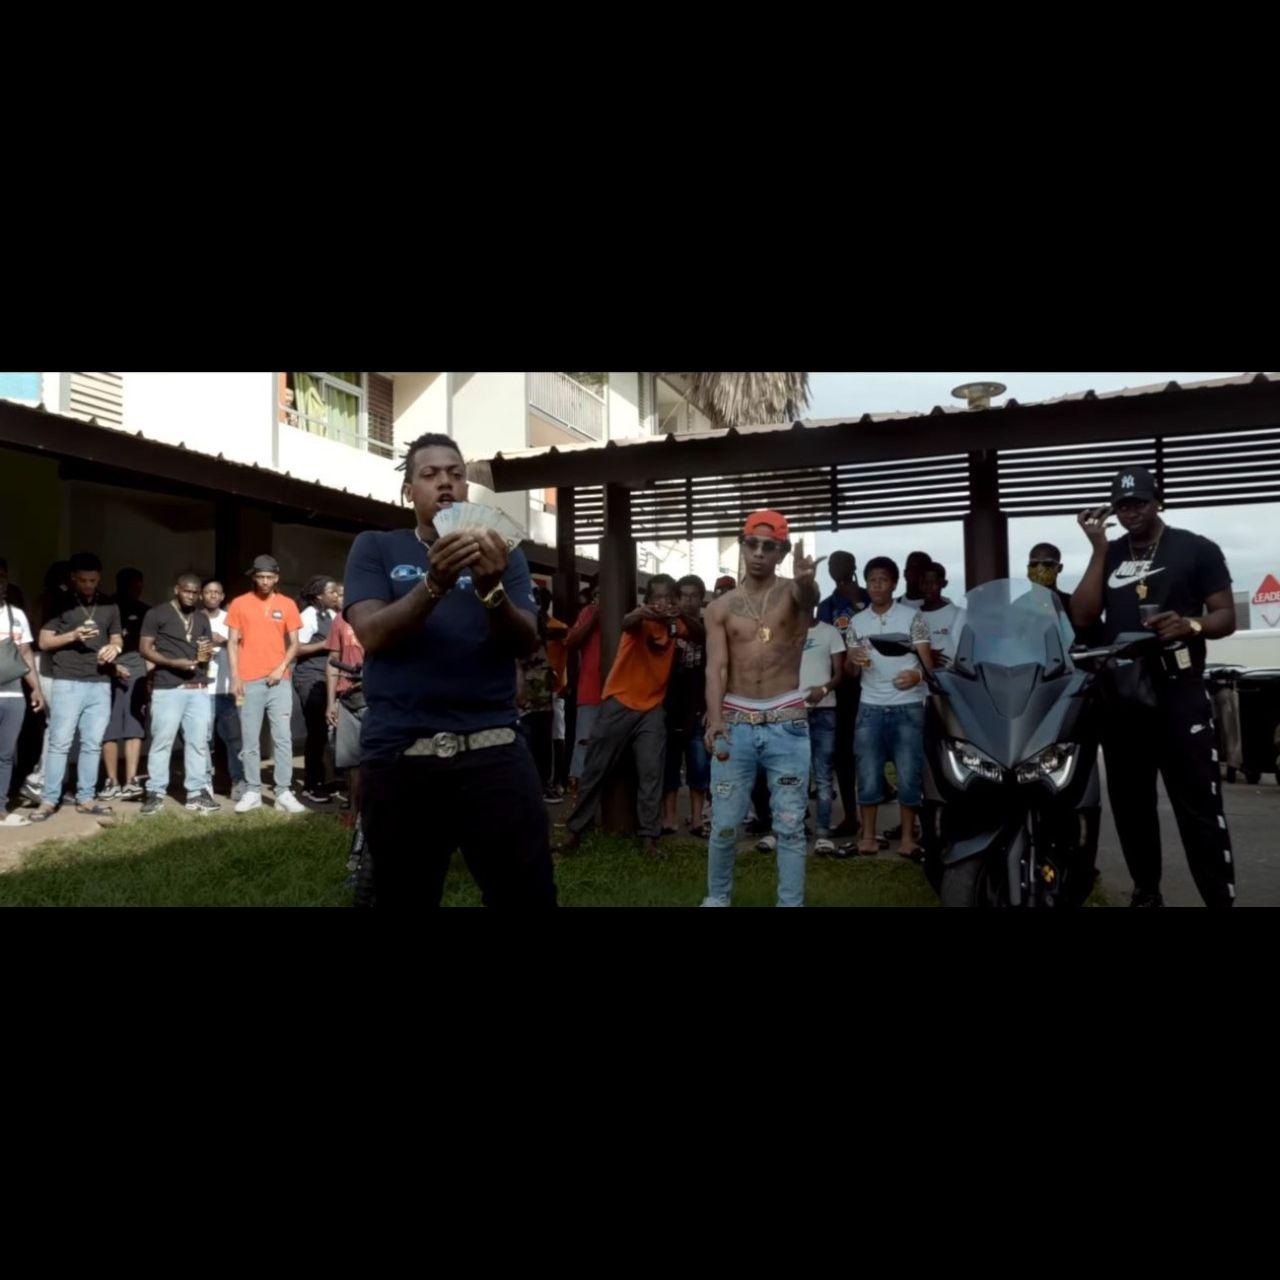 Stiwy - Zoo (ft. Lesnah) (Thumbnail)